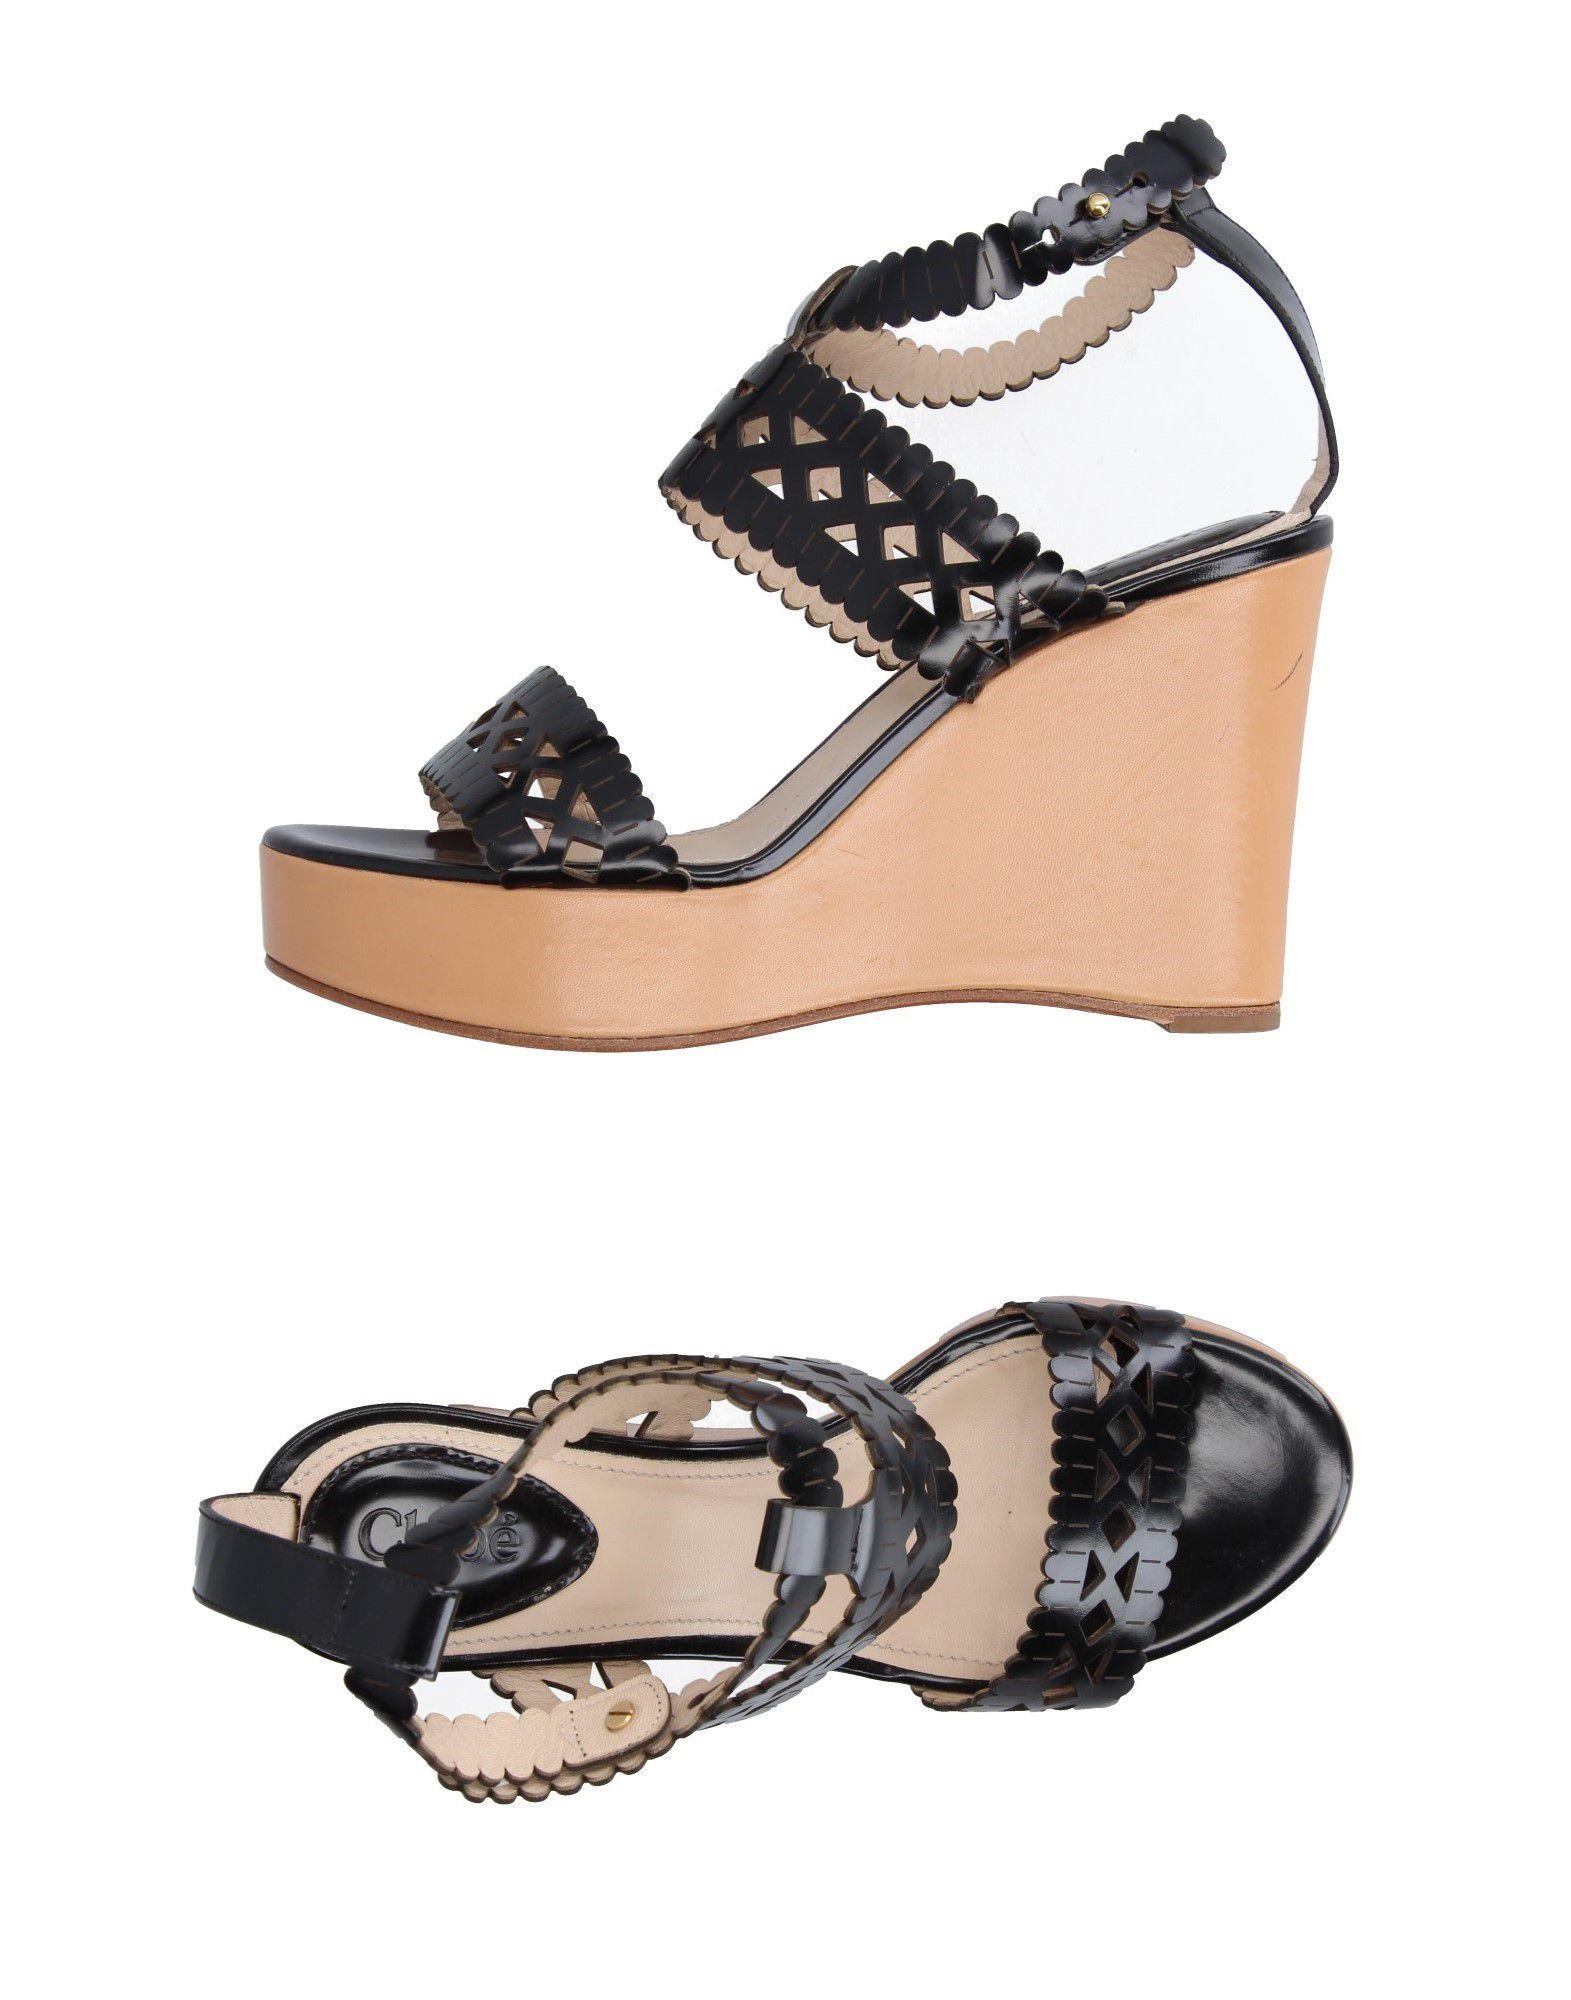 Chloé Sandalen Damen  11216712FMGut aussehende strapazierfähige Schuhe